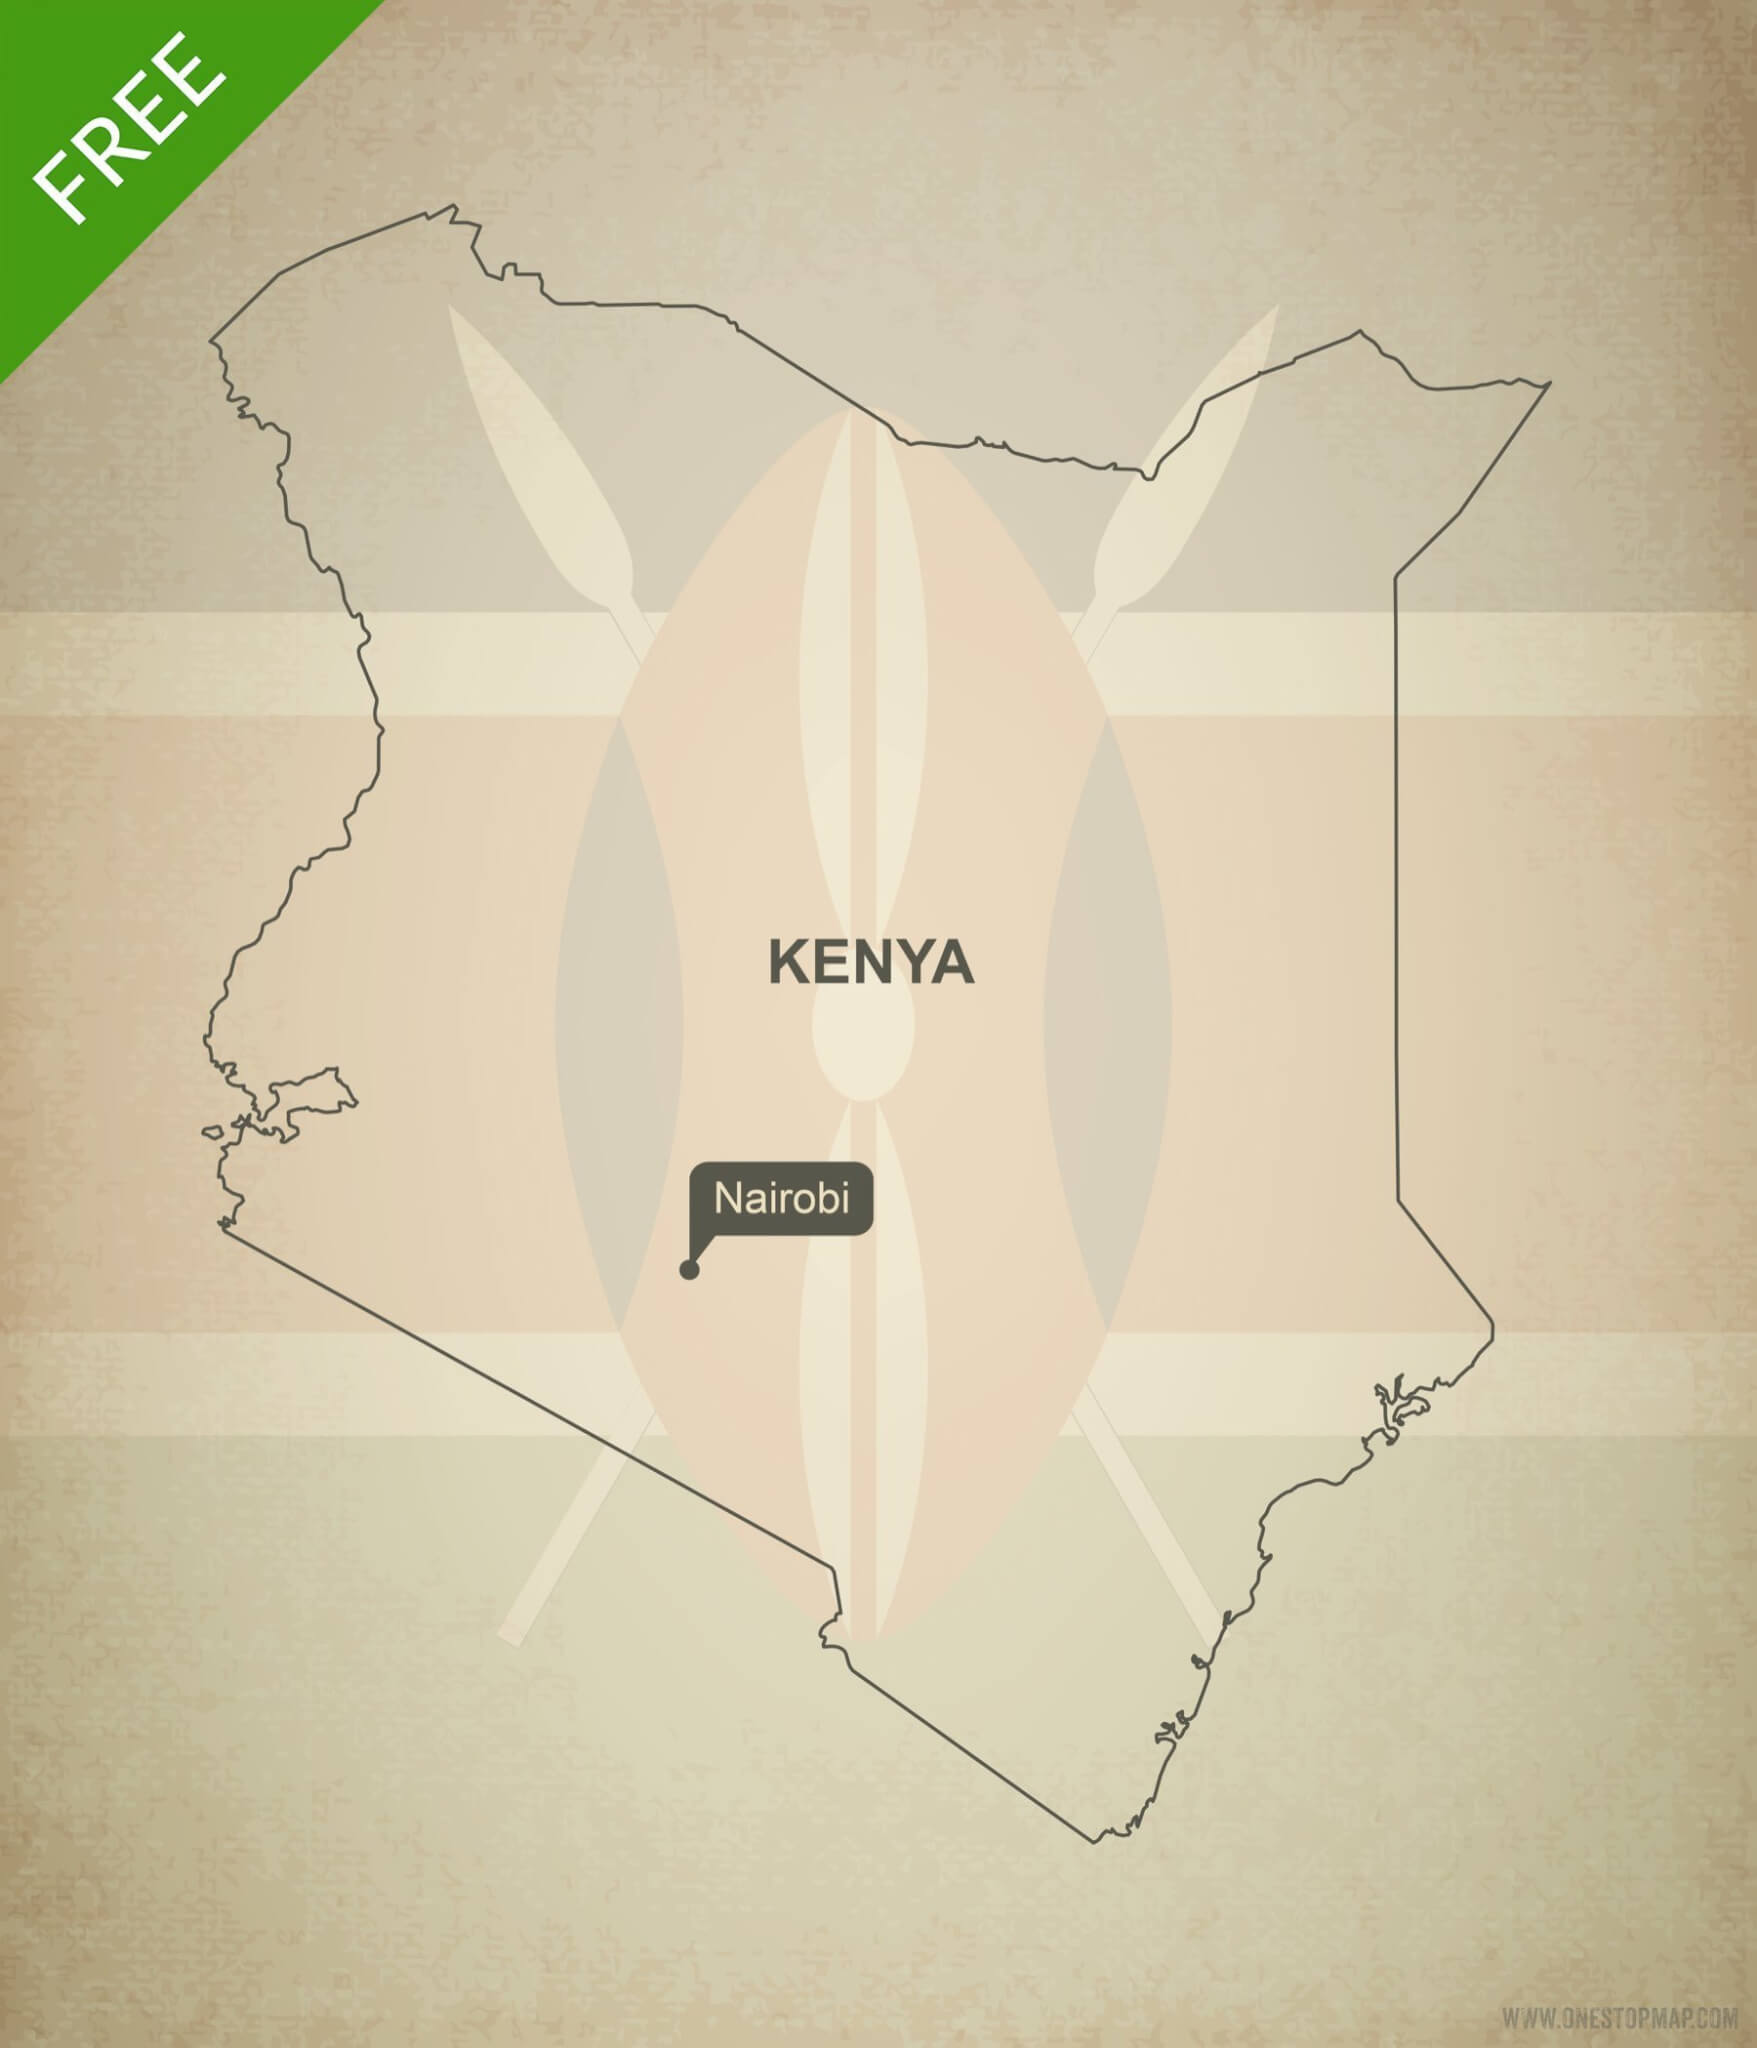 Free vector map of Kenya outline